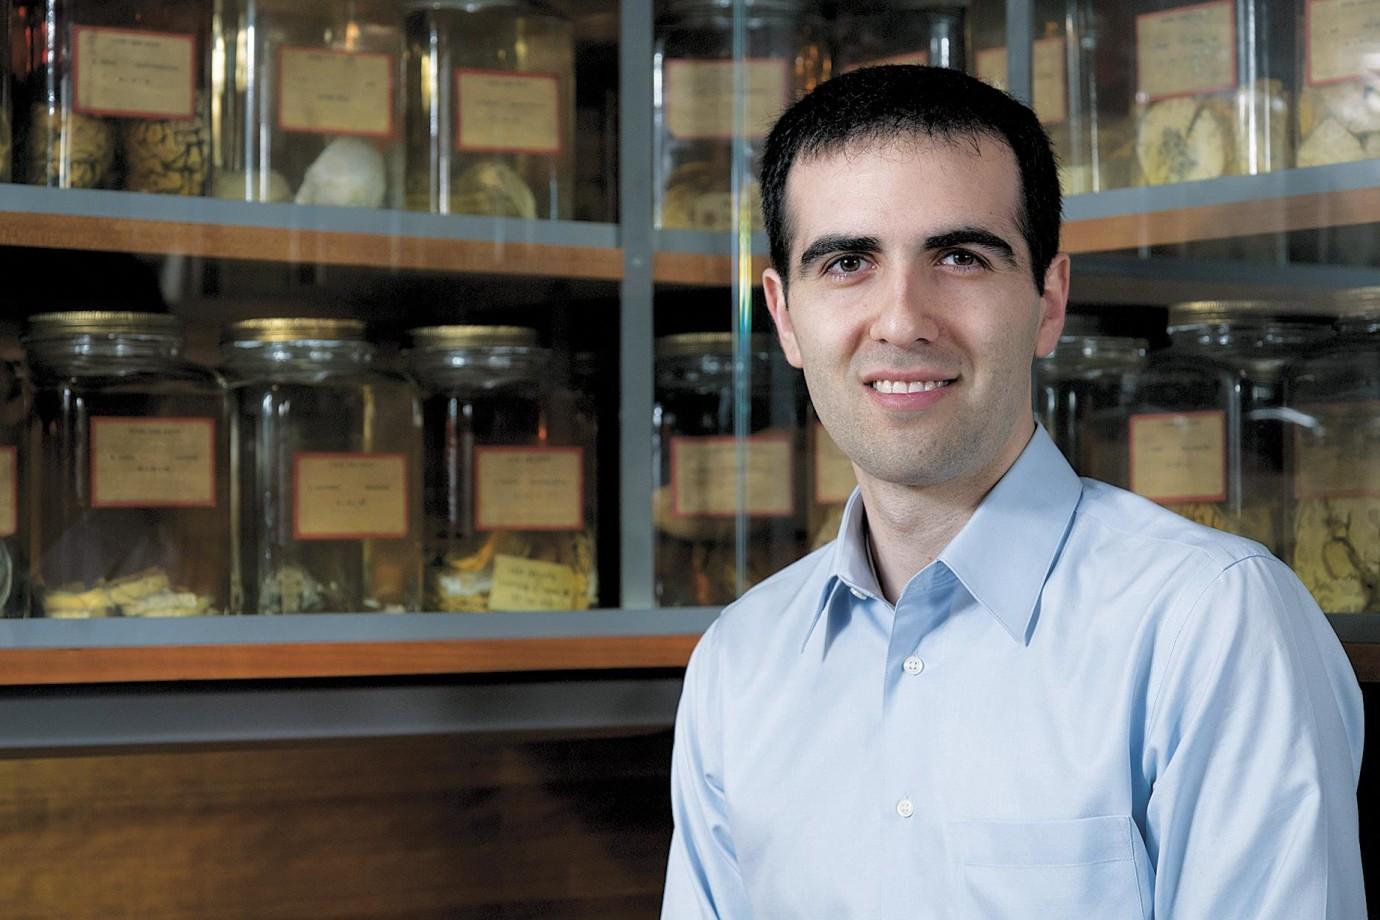 Strange behaviors may not be illogical, says Eliezer Sternberg, a first-year neurology resident.